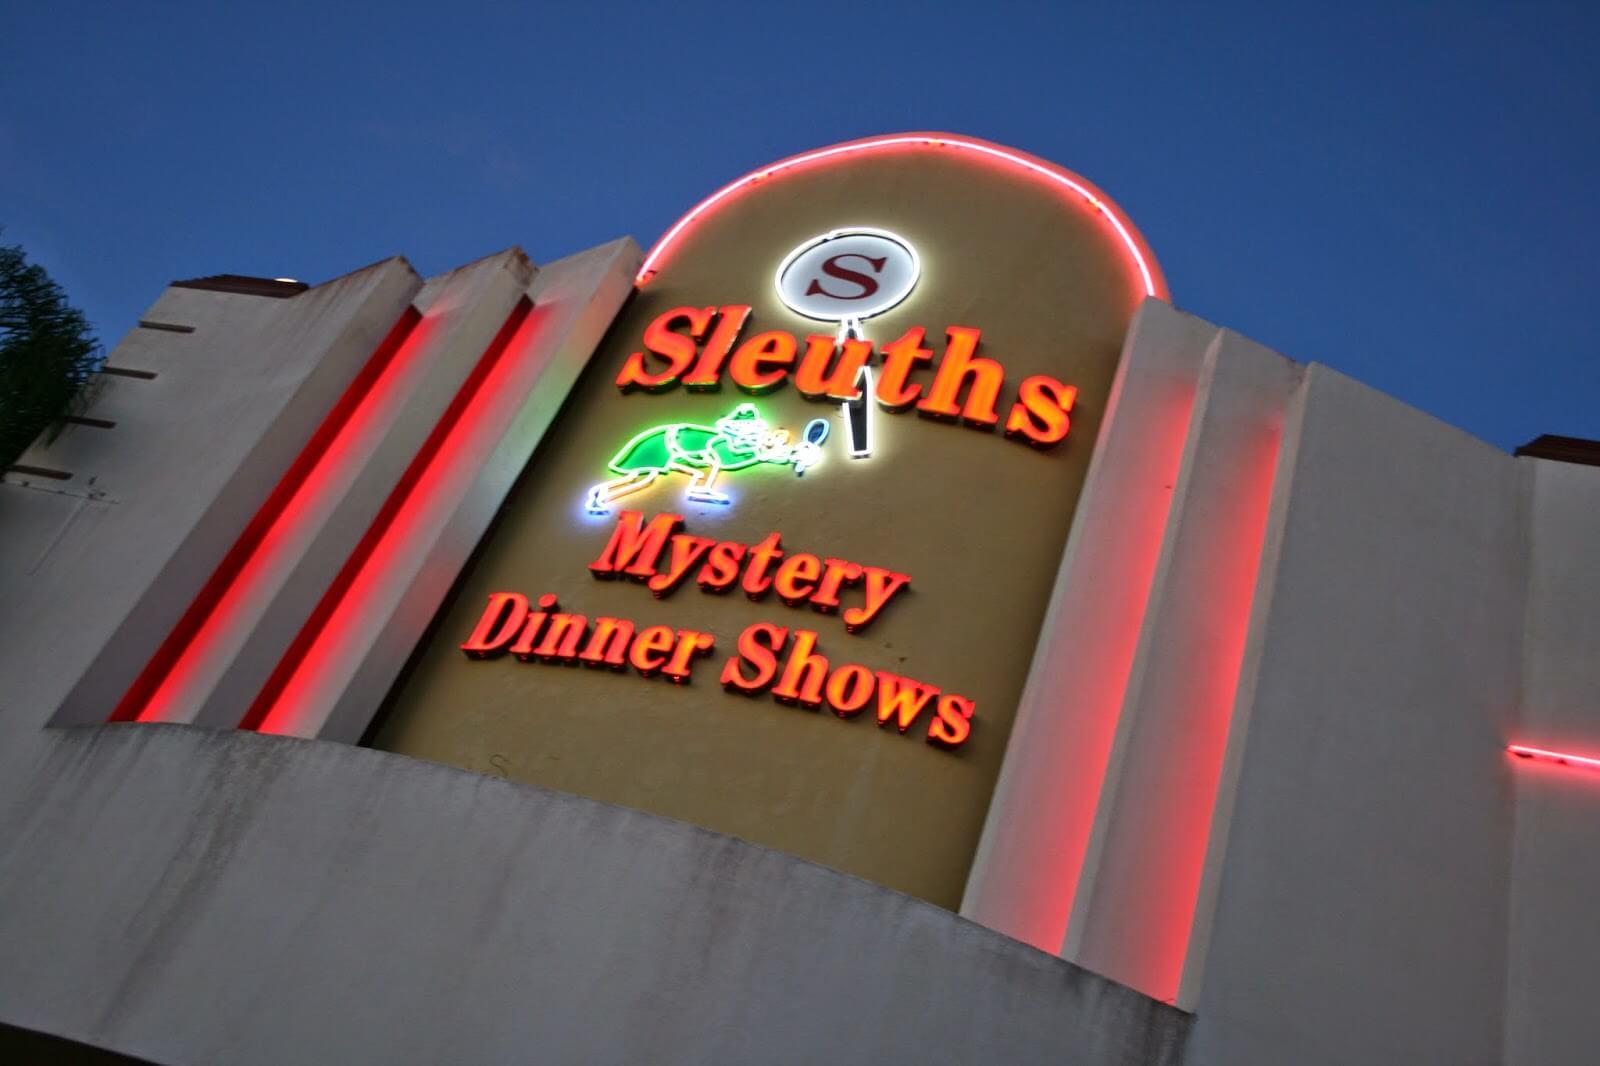 Sleuths Mystery Dinner Shows | Orlando